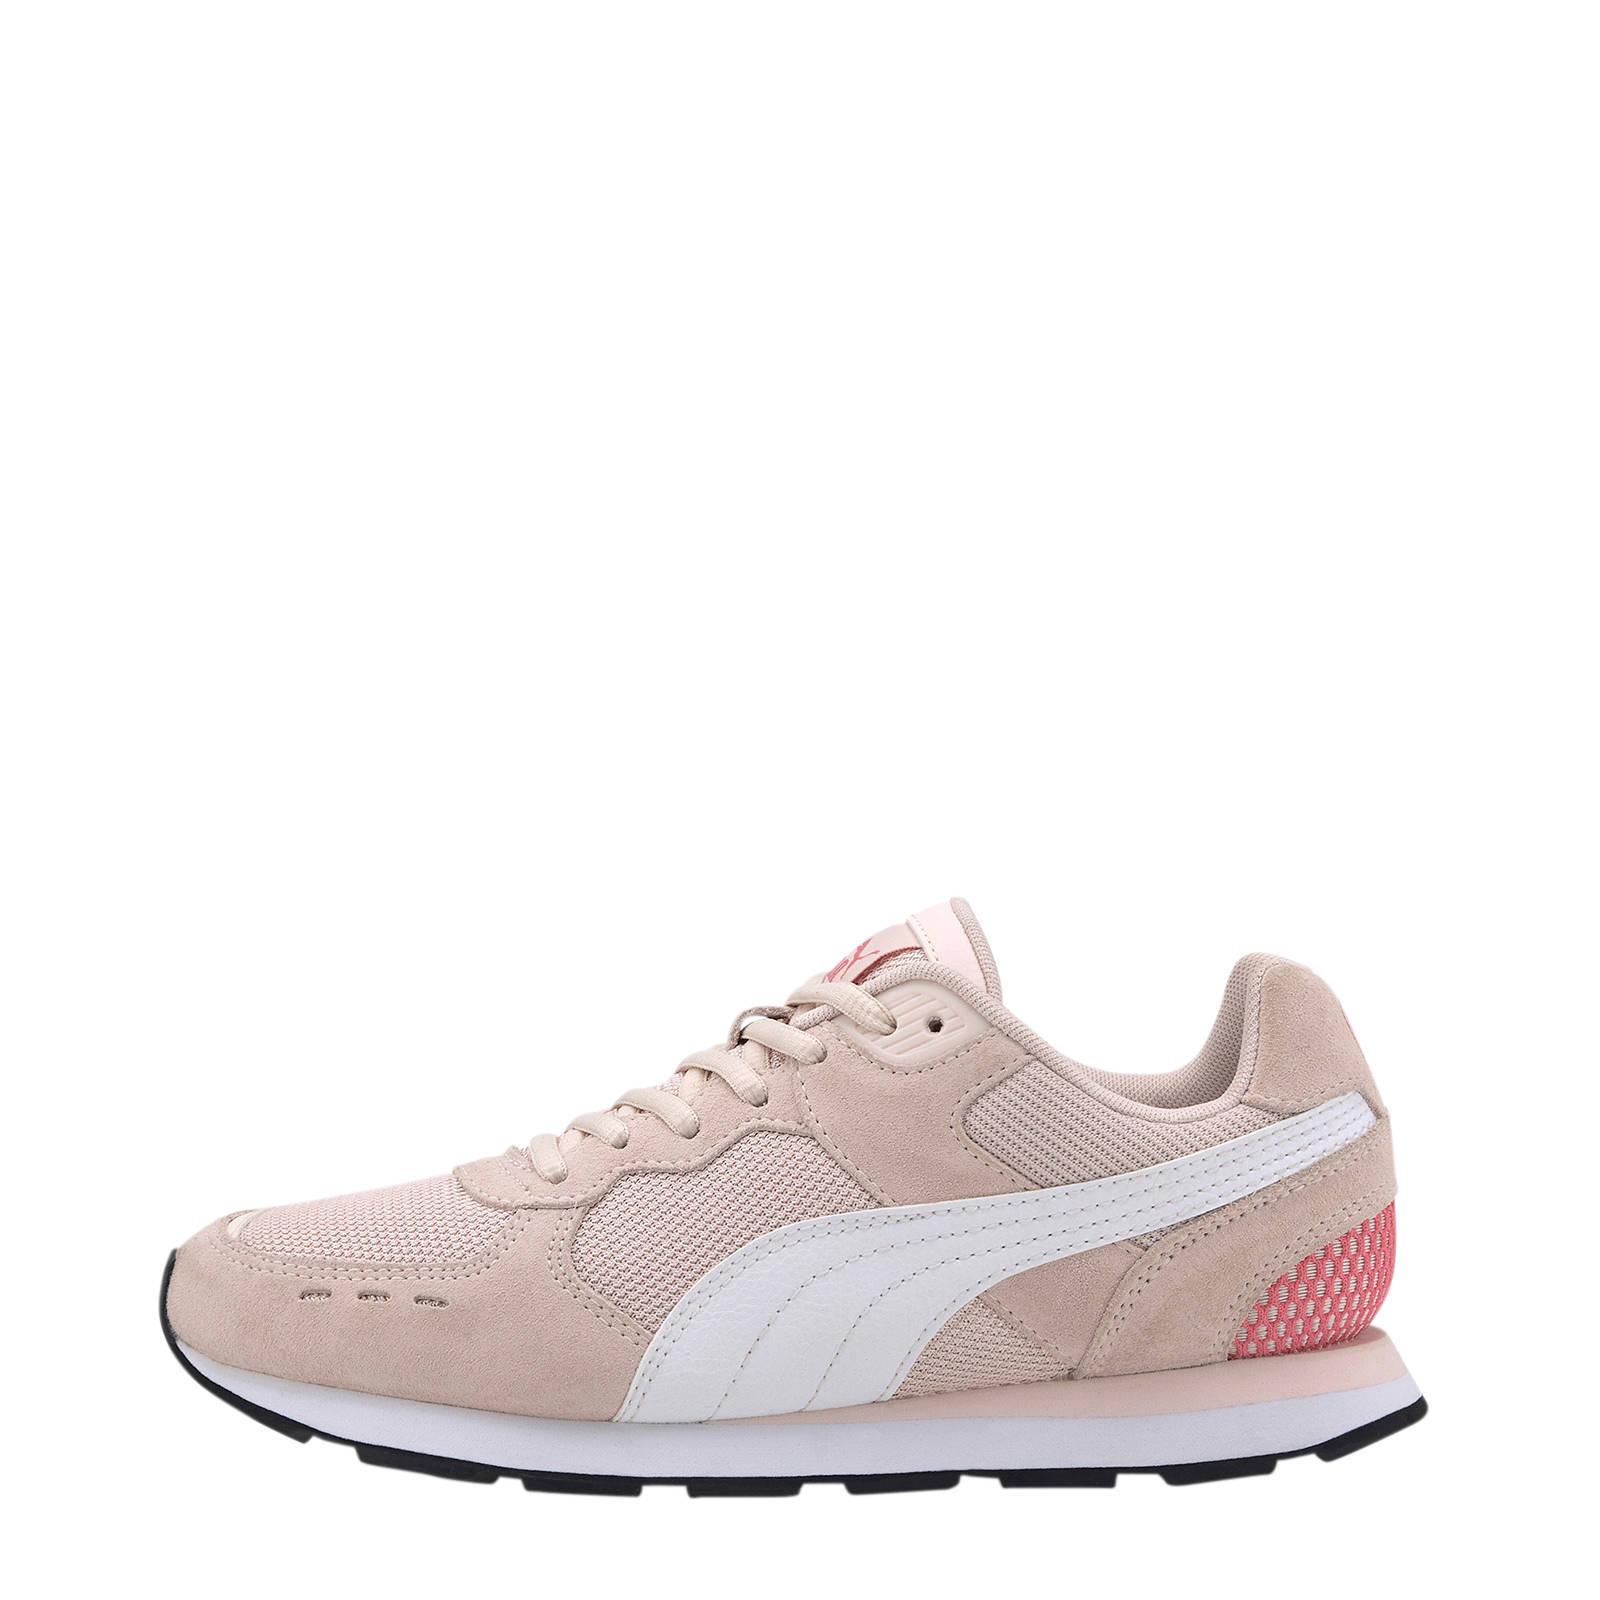 Puma Vista suède sneakers beige/roze | wehkamp